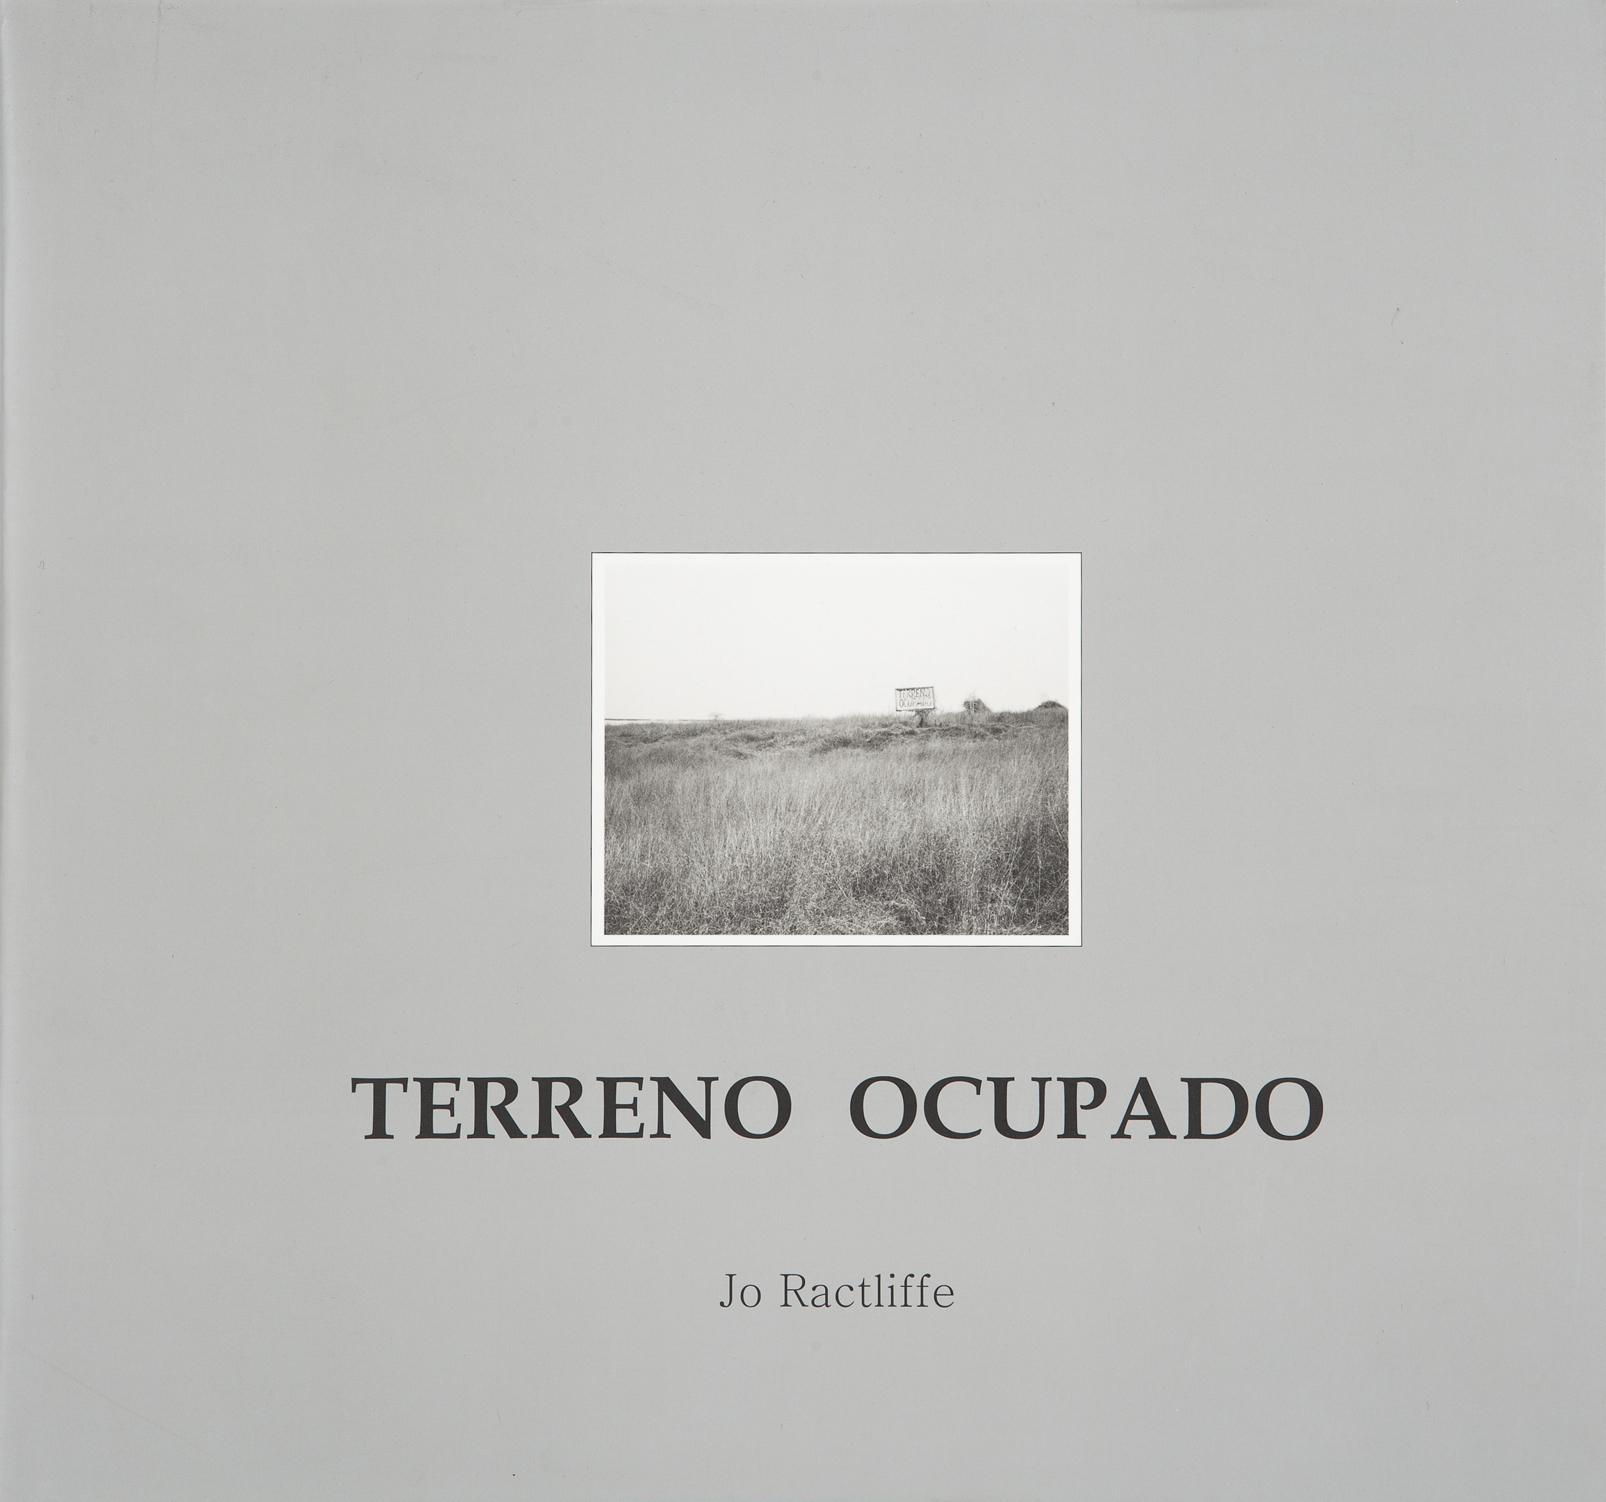 Terreno Ocupado